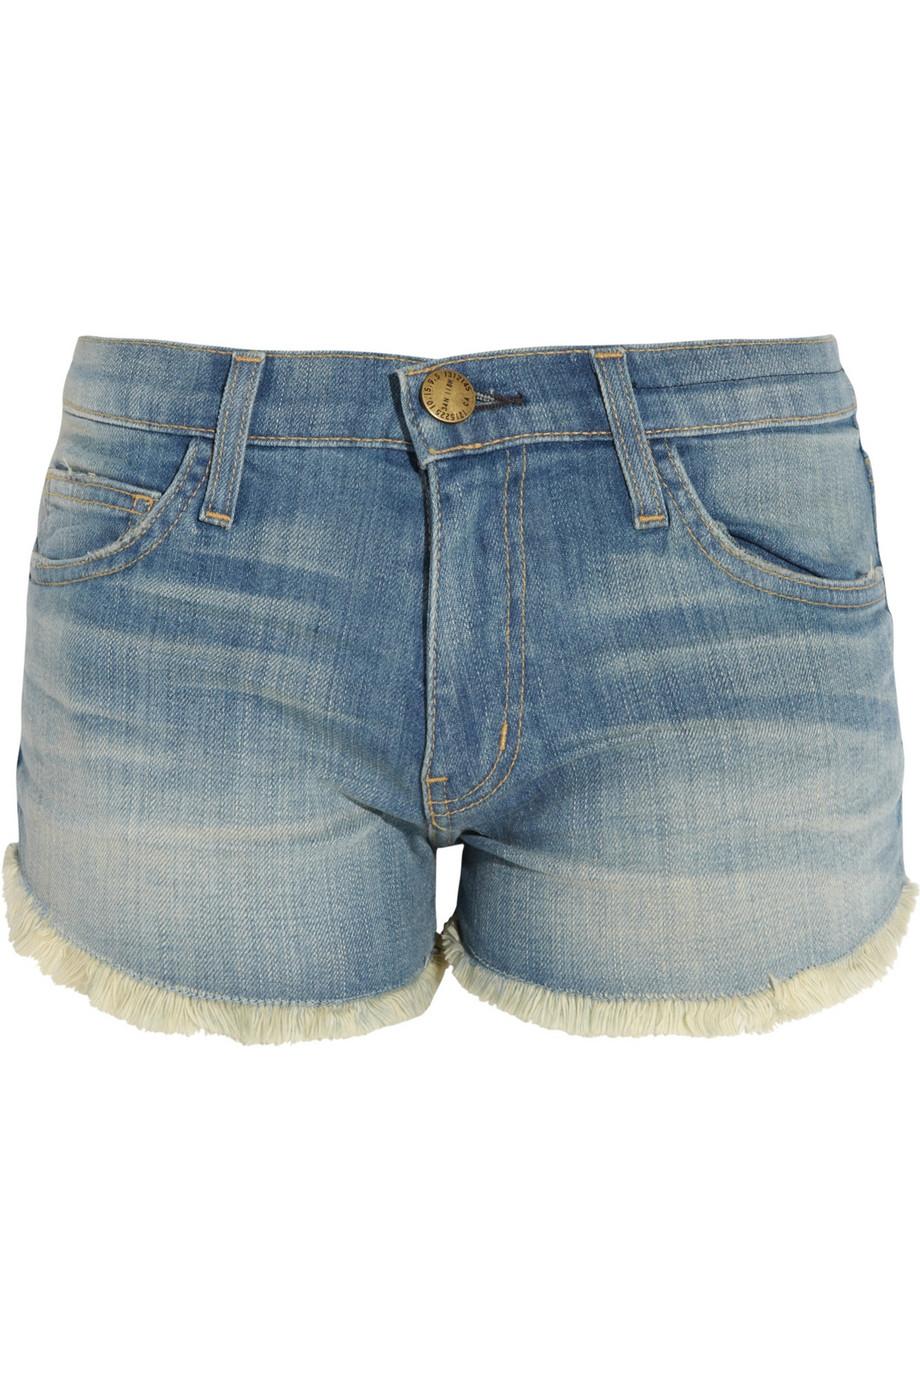 Current/elliott The Gam Cut-off Denim Shorts in Blue | Lyst